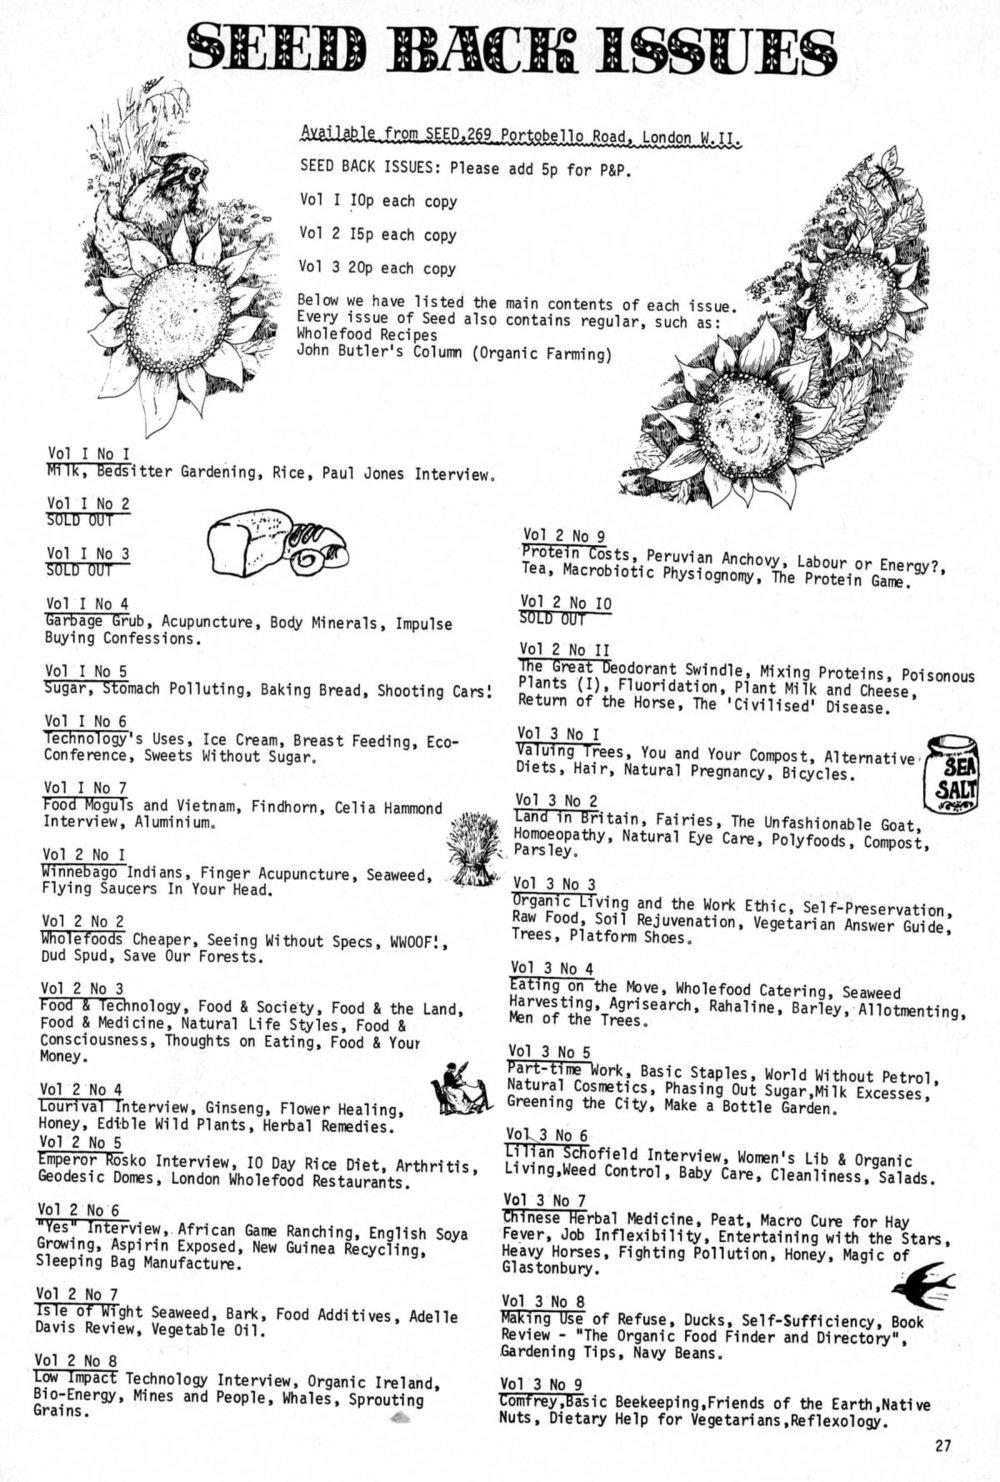 seed-v3-n10-oct1974-27.jpg